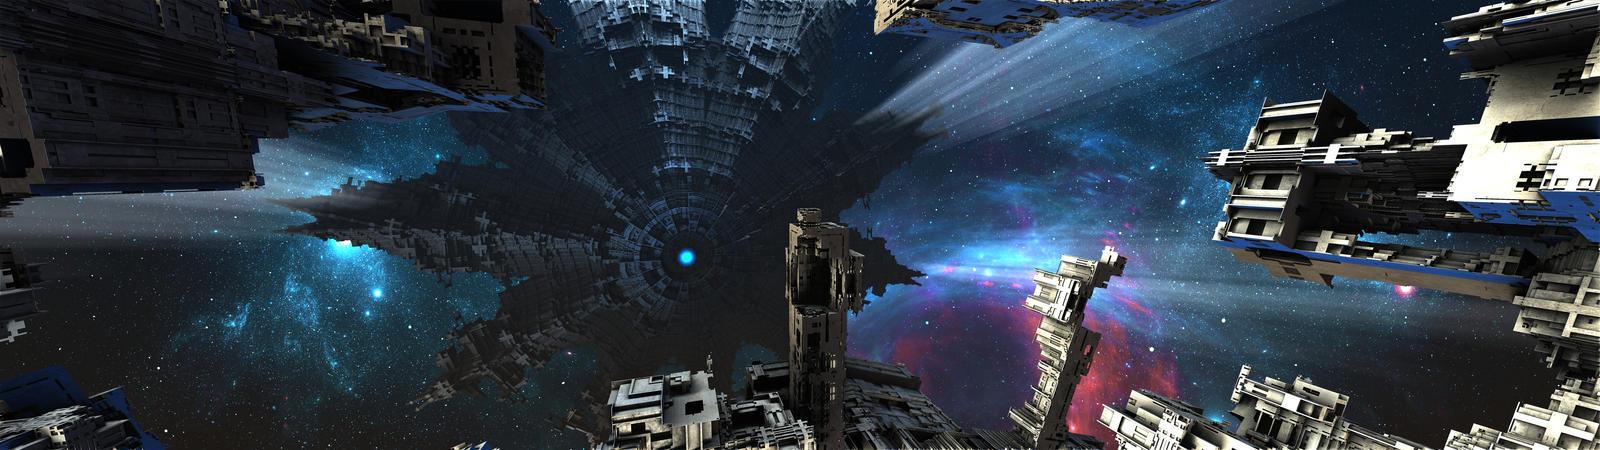 Experimental Borg Starship